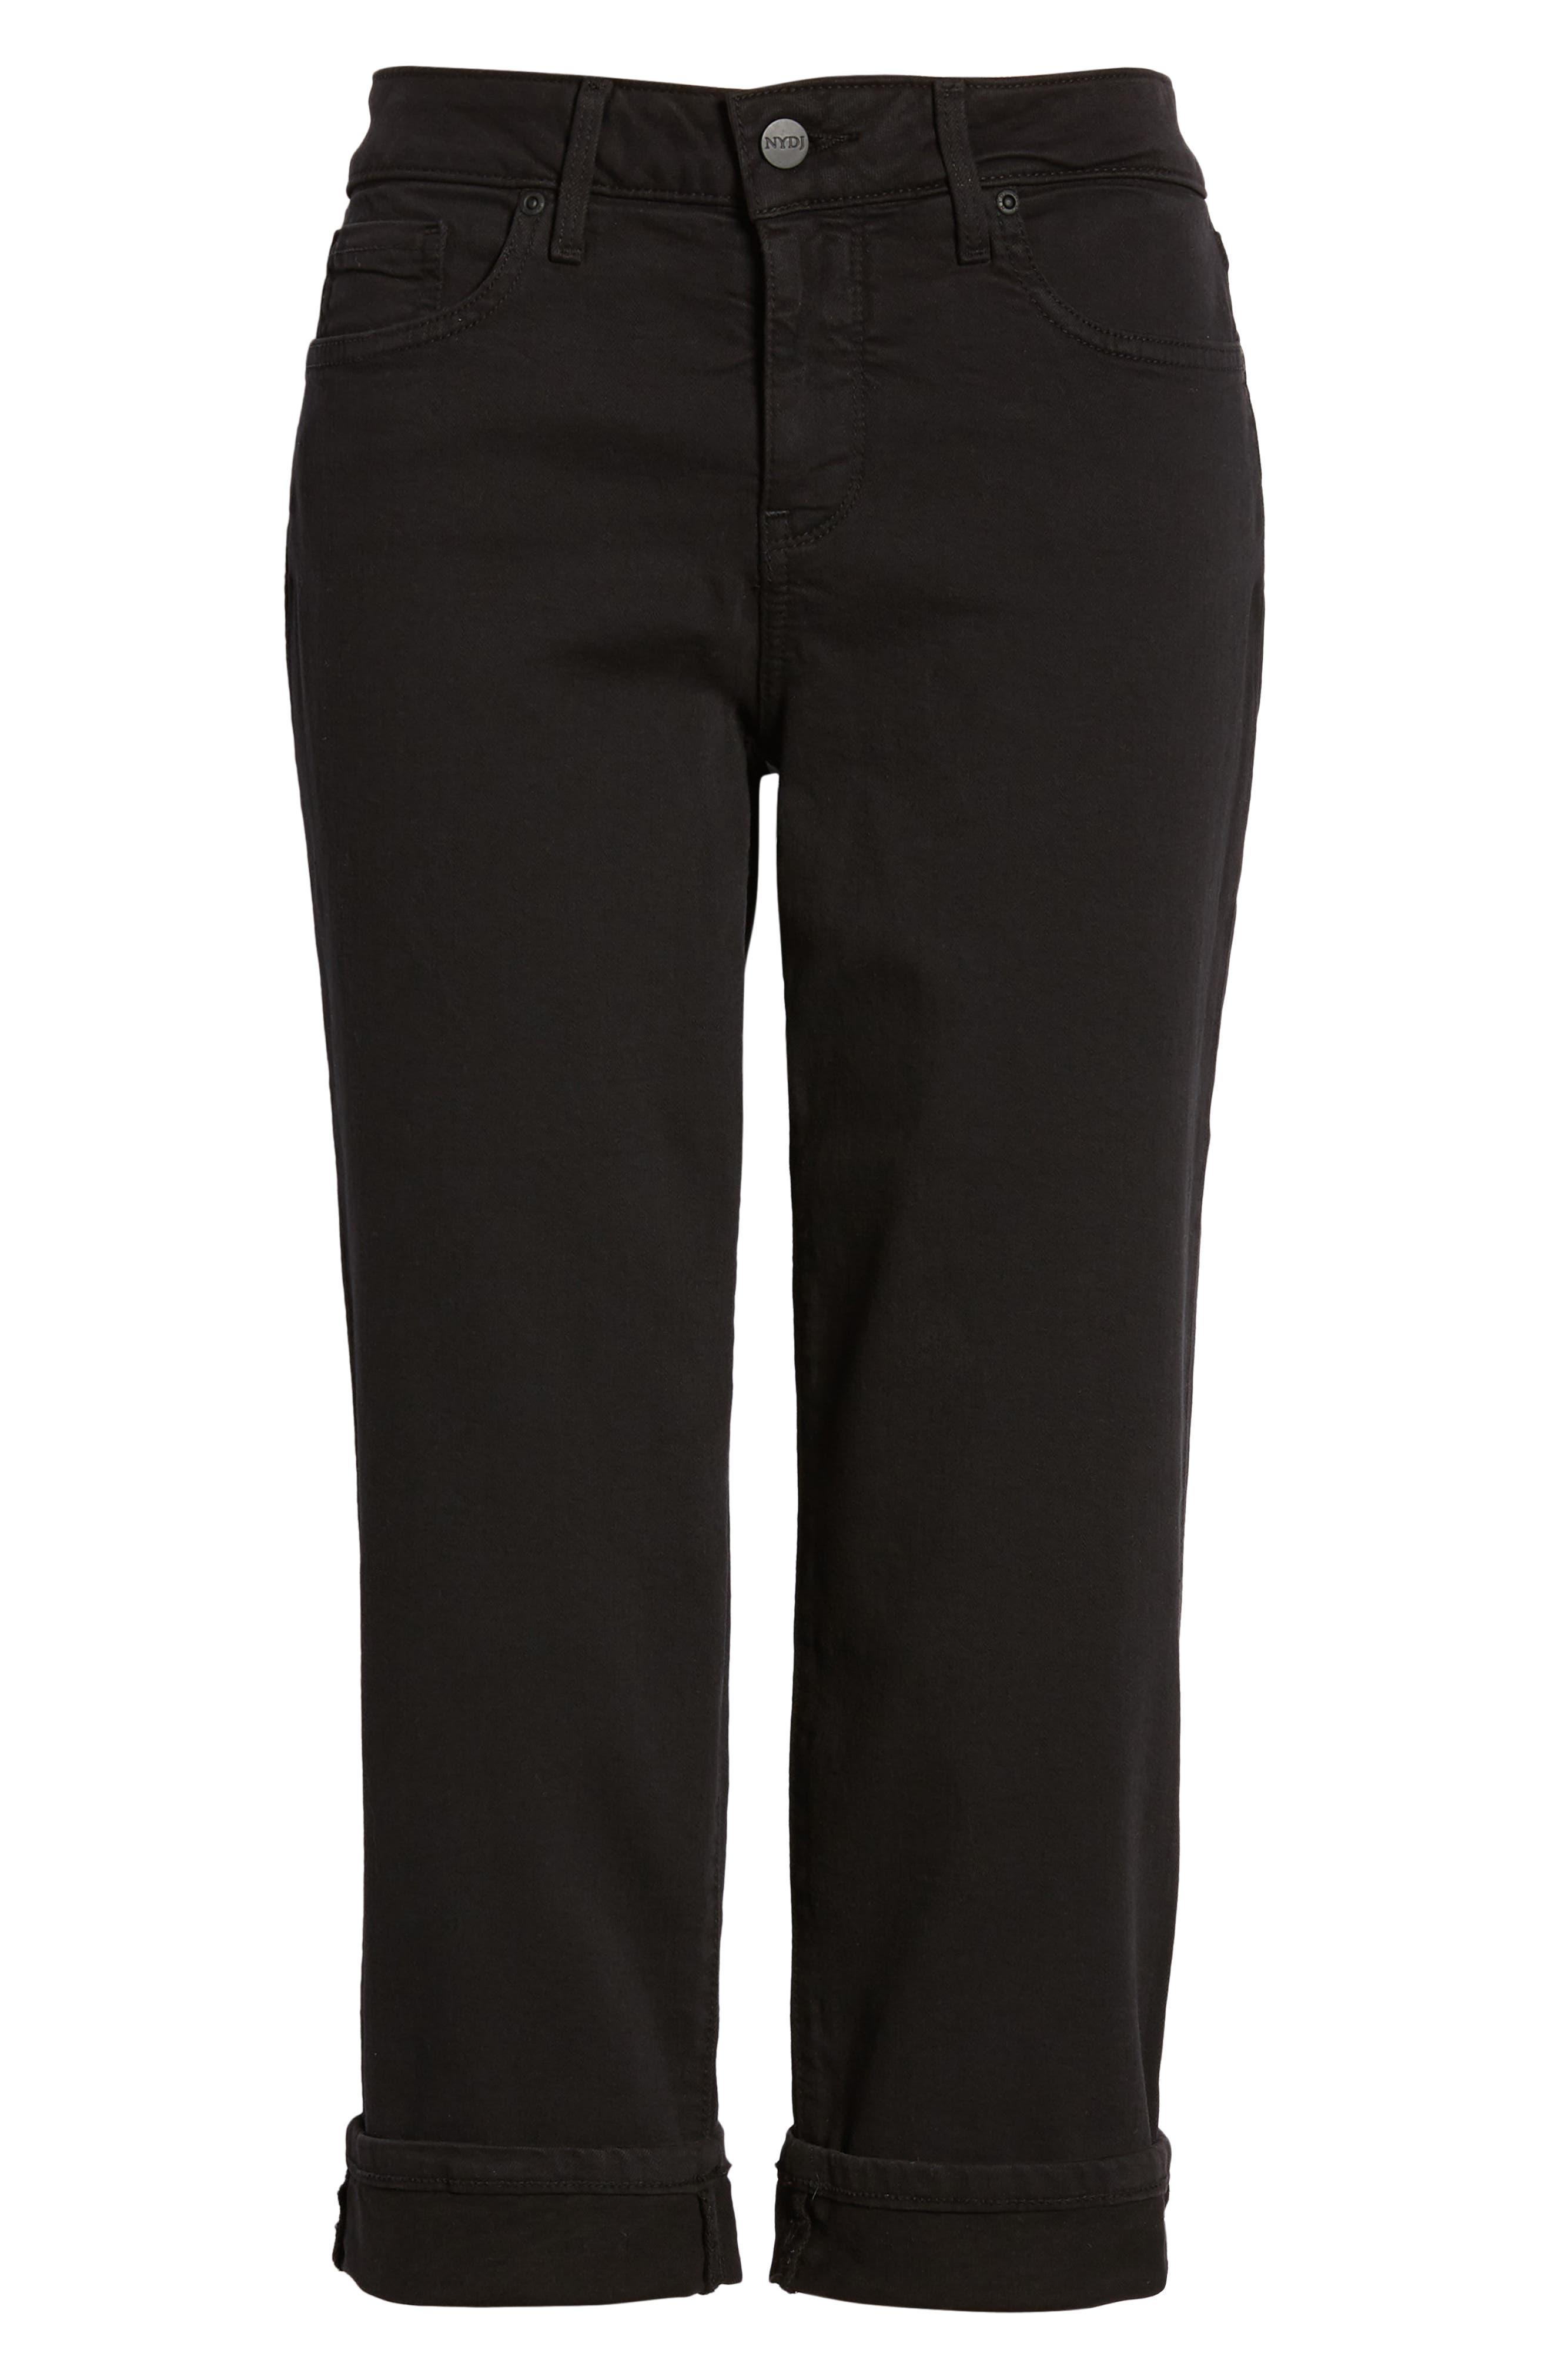 NYDJ, Marilyn Crop Jeans, Alternate thumbnail 5, color, BLACK